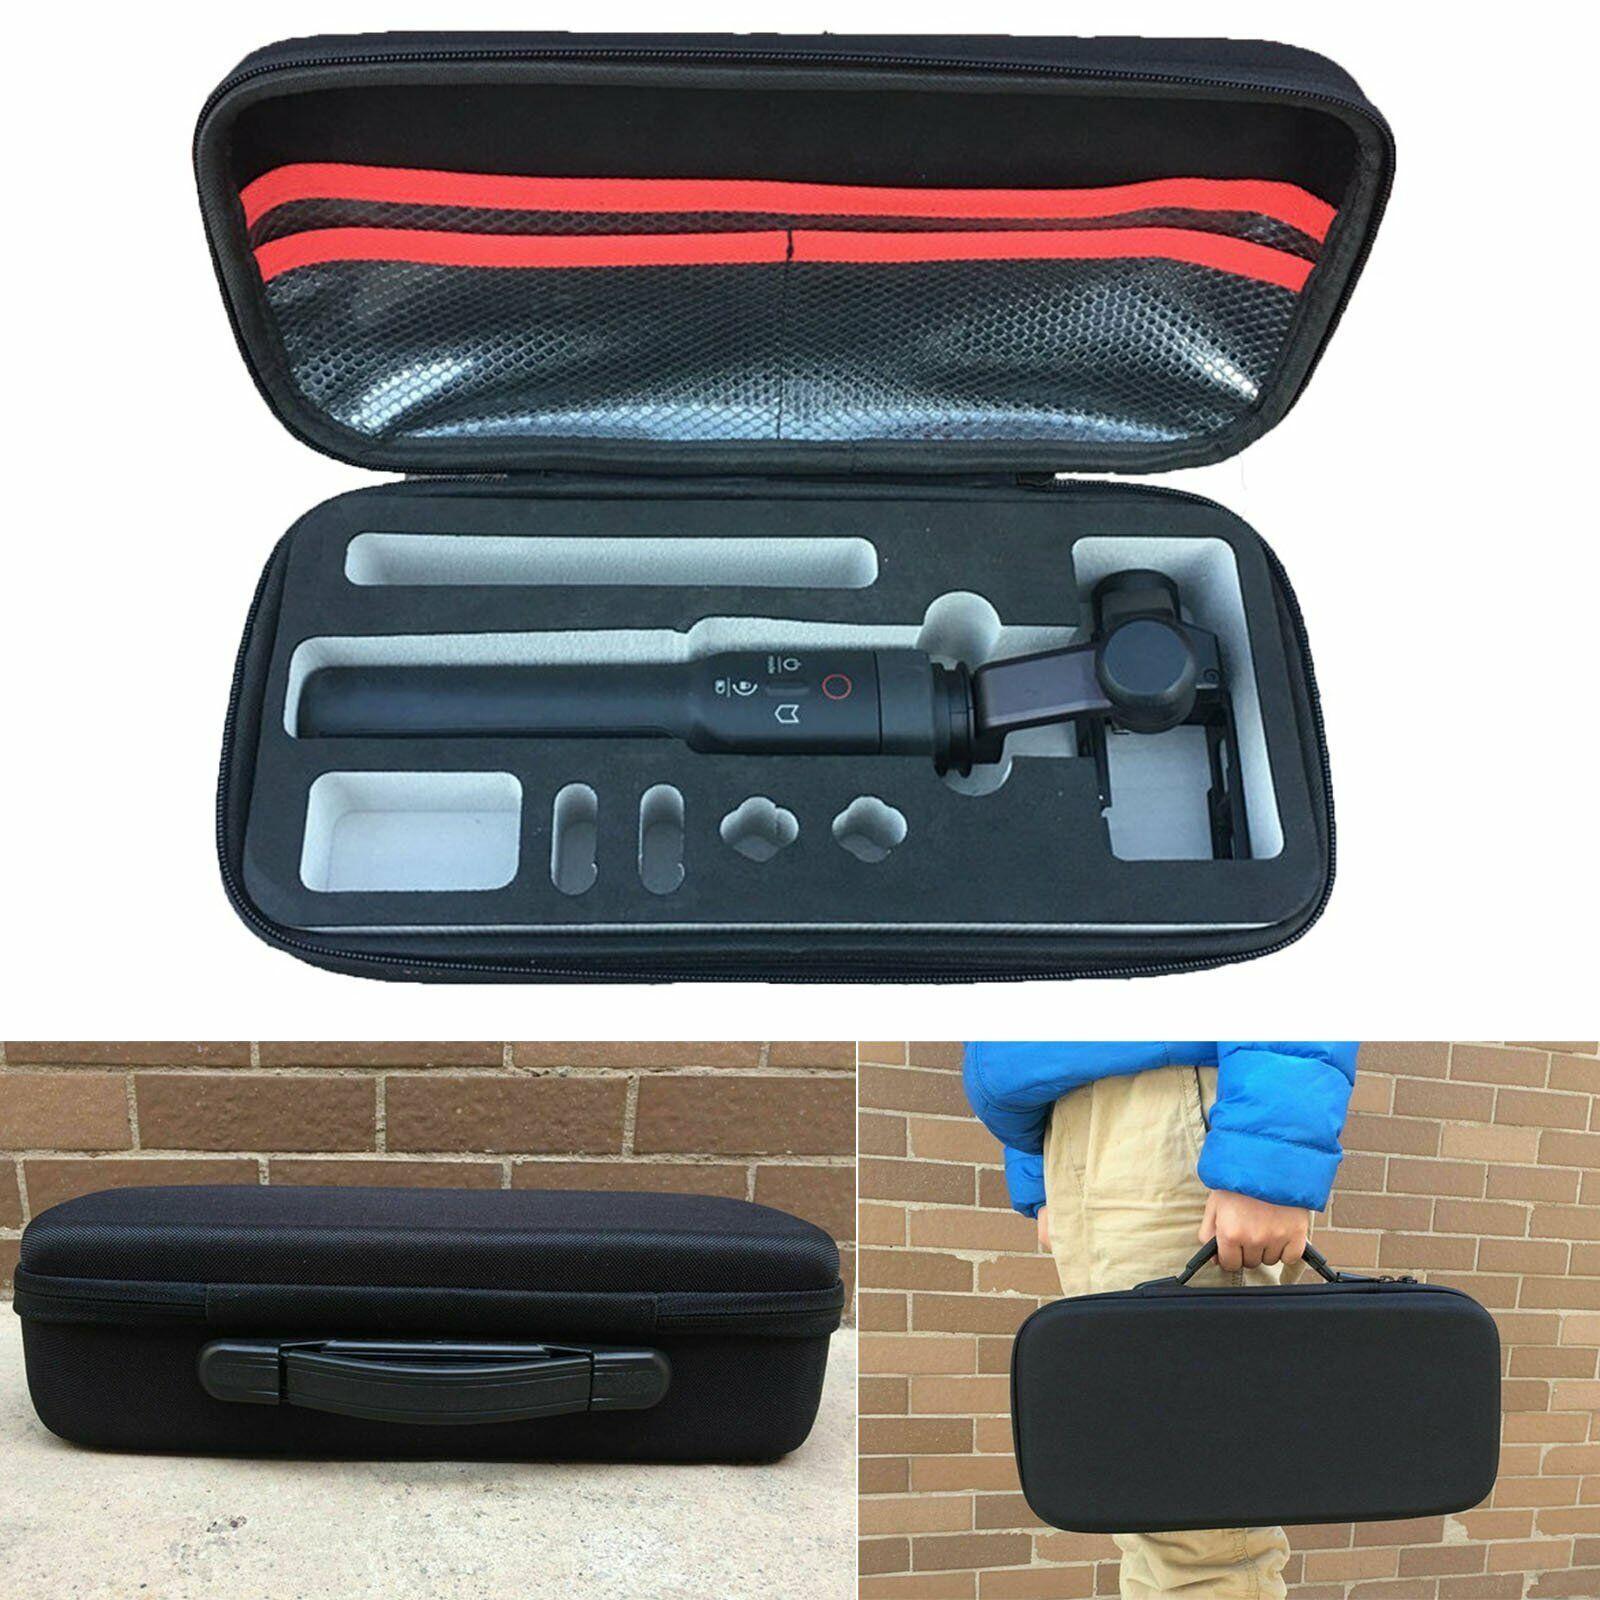 Portable Hard Case Carrying Bag For Gopro Karma Grip Hero 6/5 Gimbal Stabilitzer